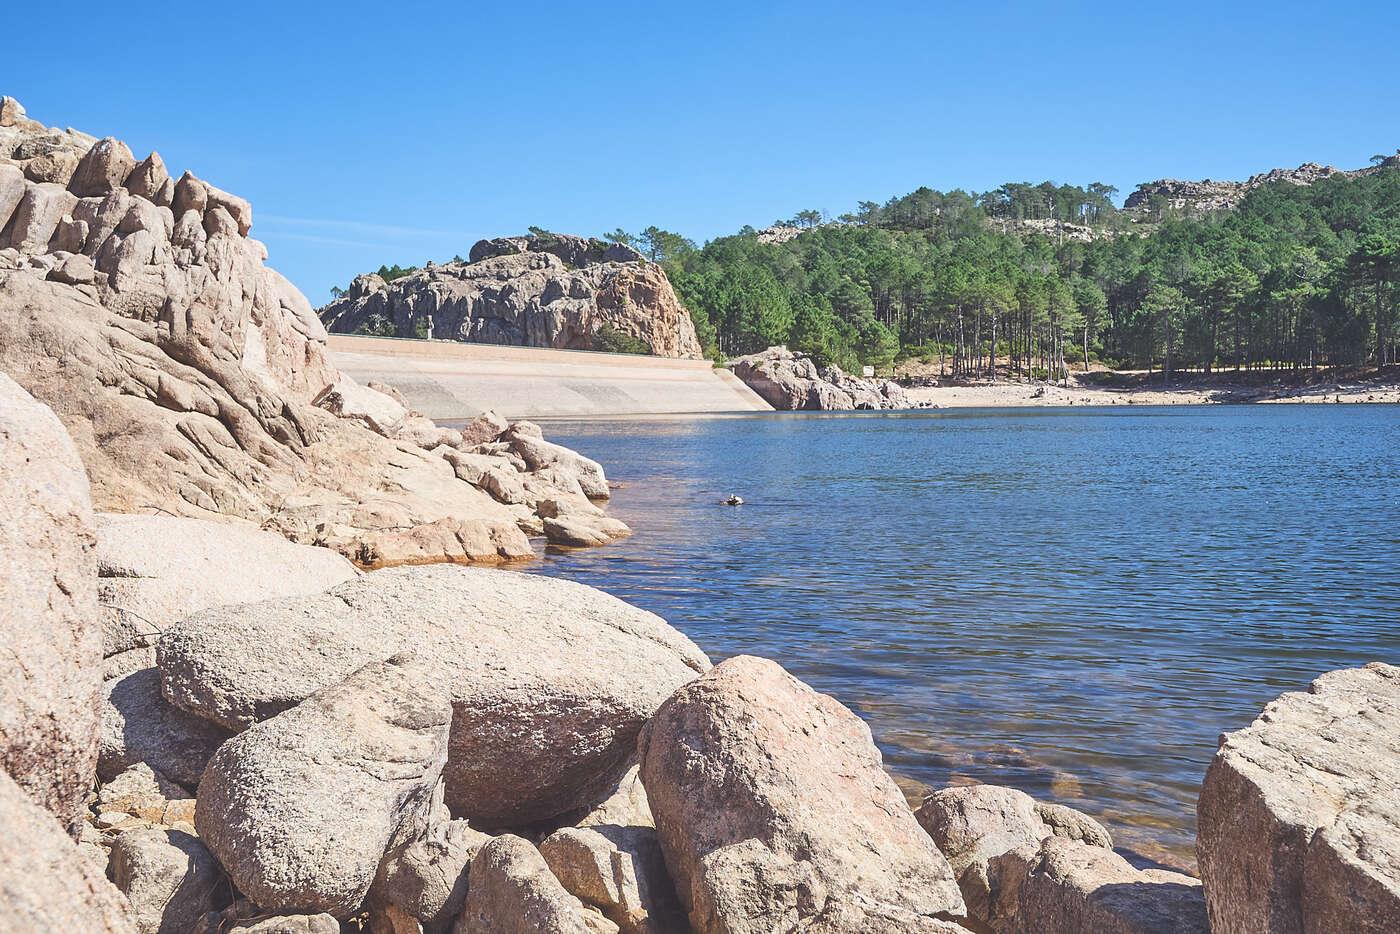 Barrage dans l'Alta-Rocca, en Corse